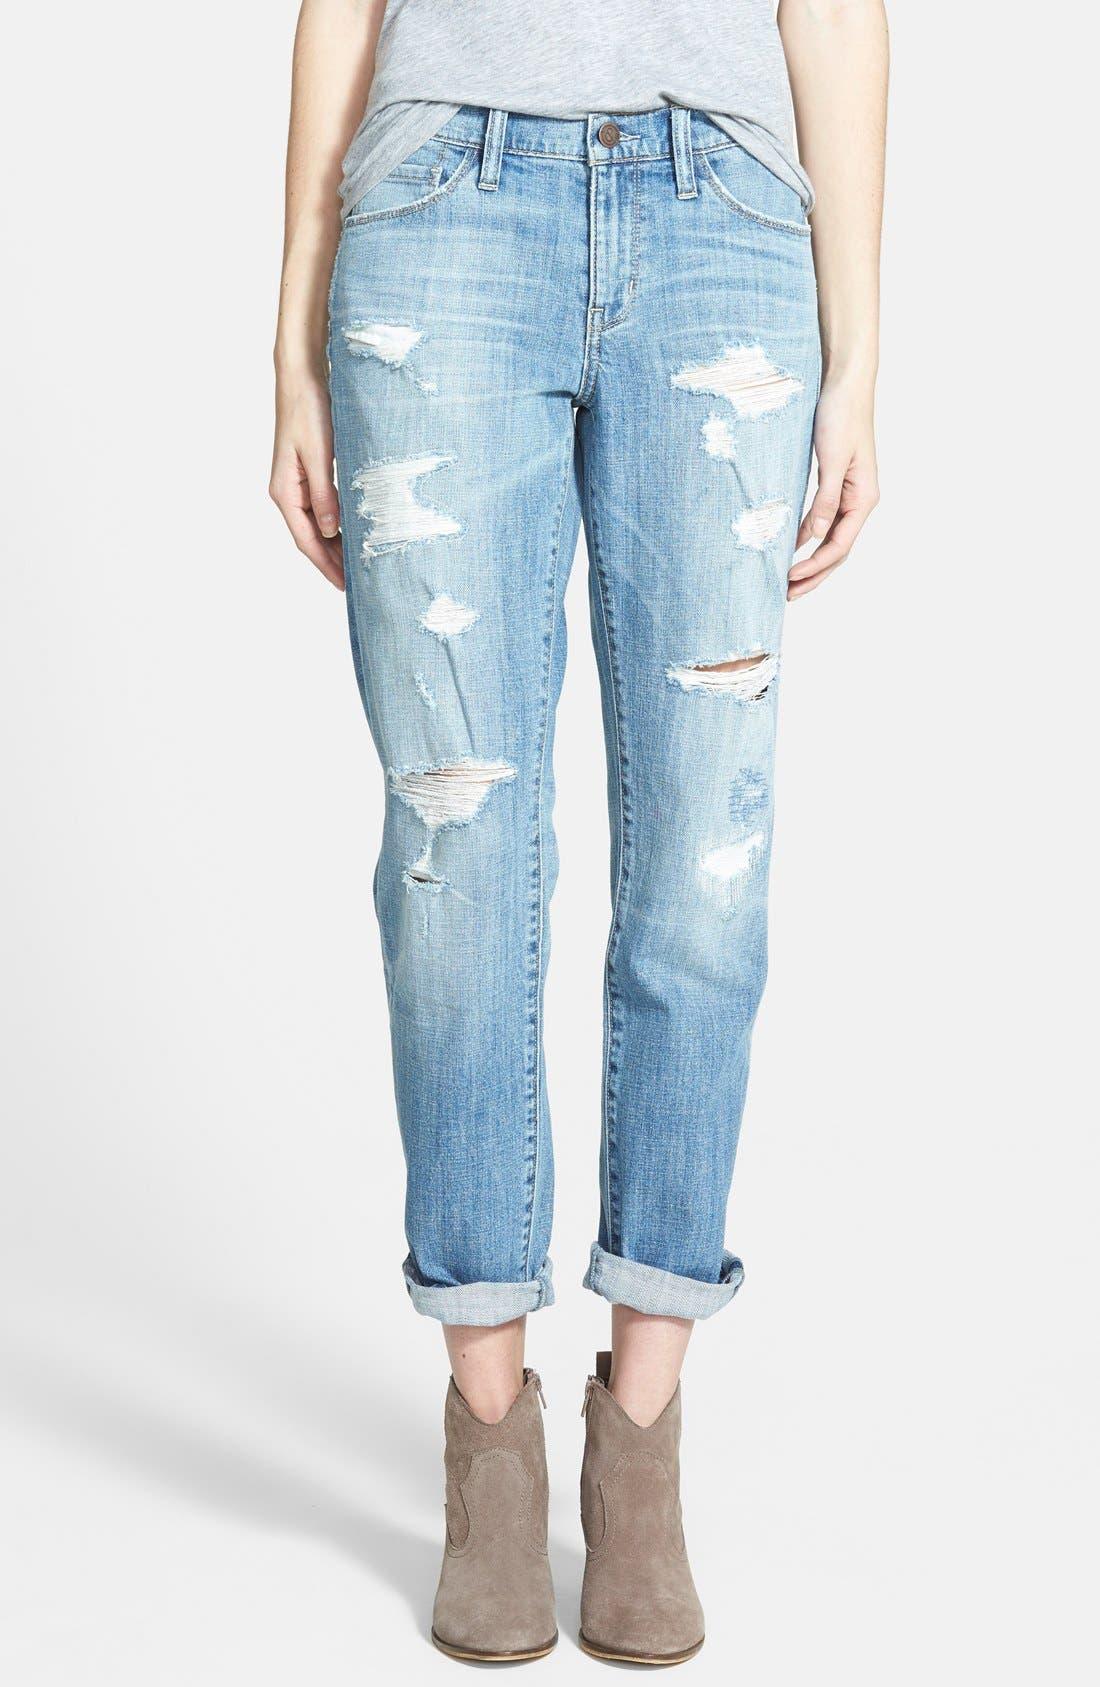 Alternate Image 1 Selected - Treasure&Bond Destructed Boyfriend Jeans (Blue Jay Light Rip & Repair)